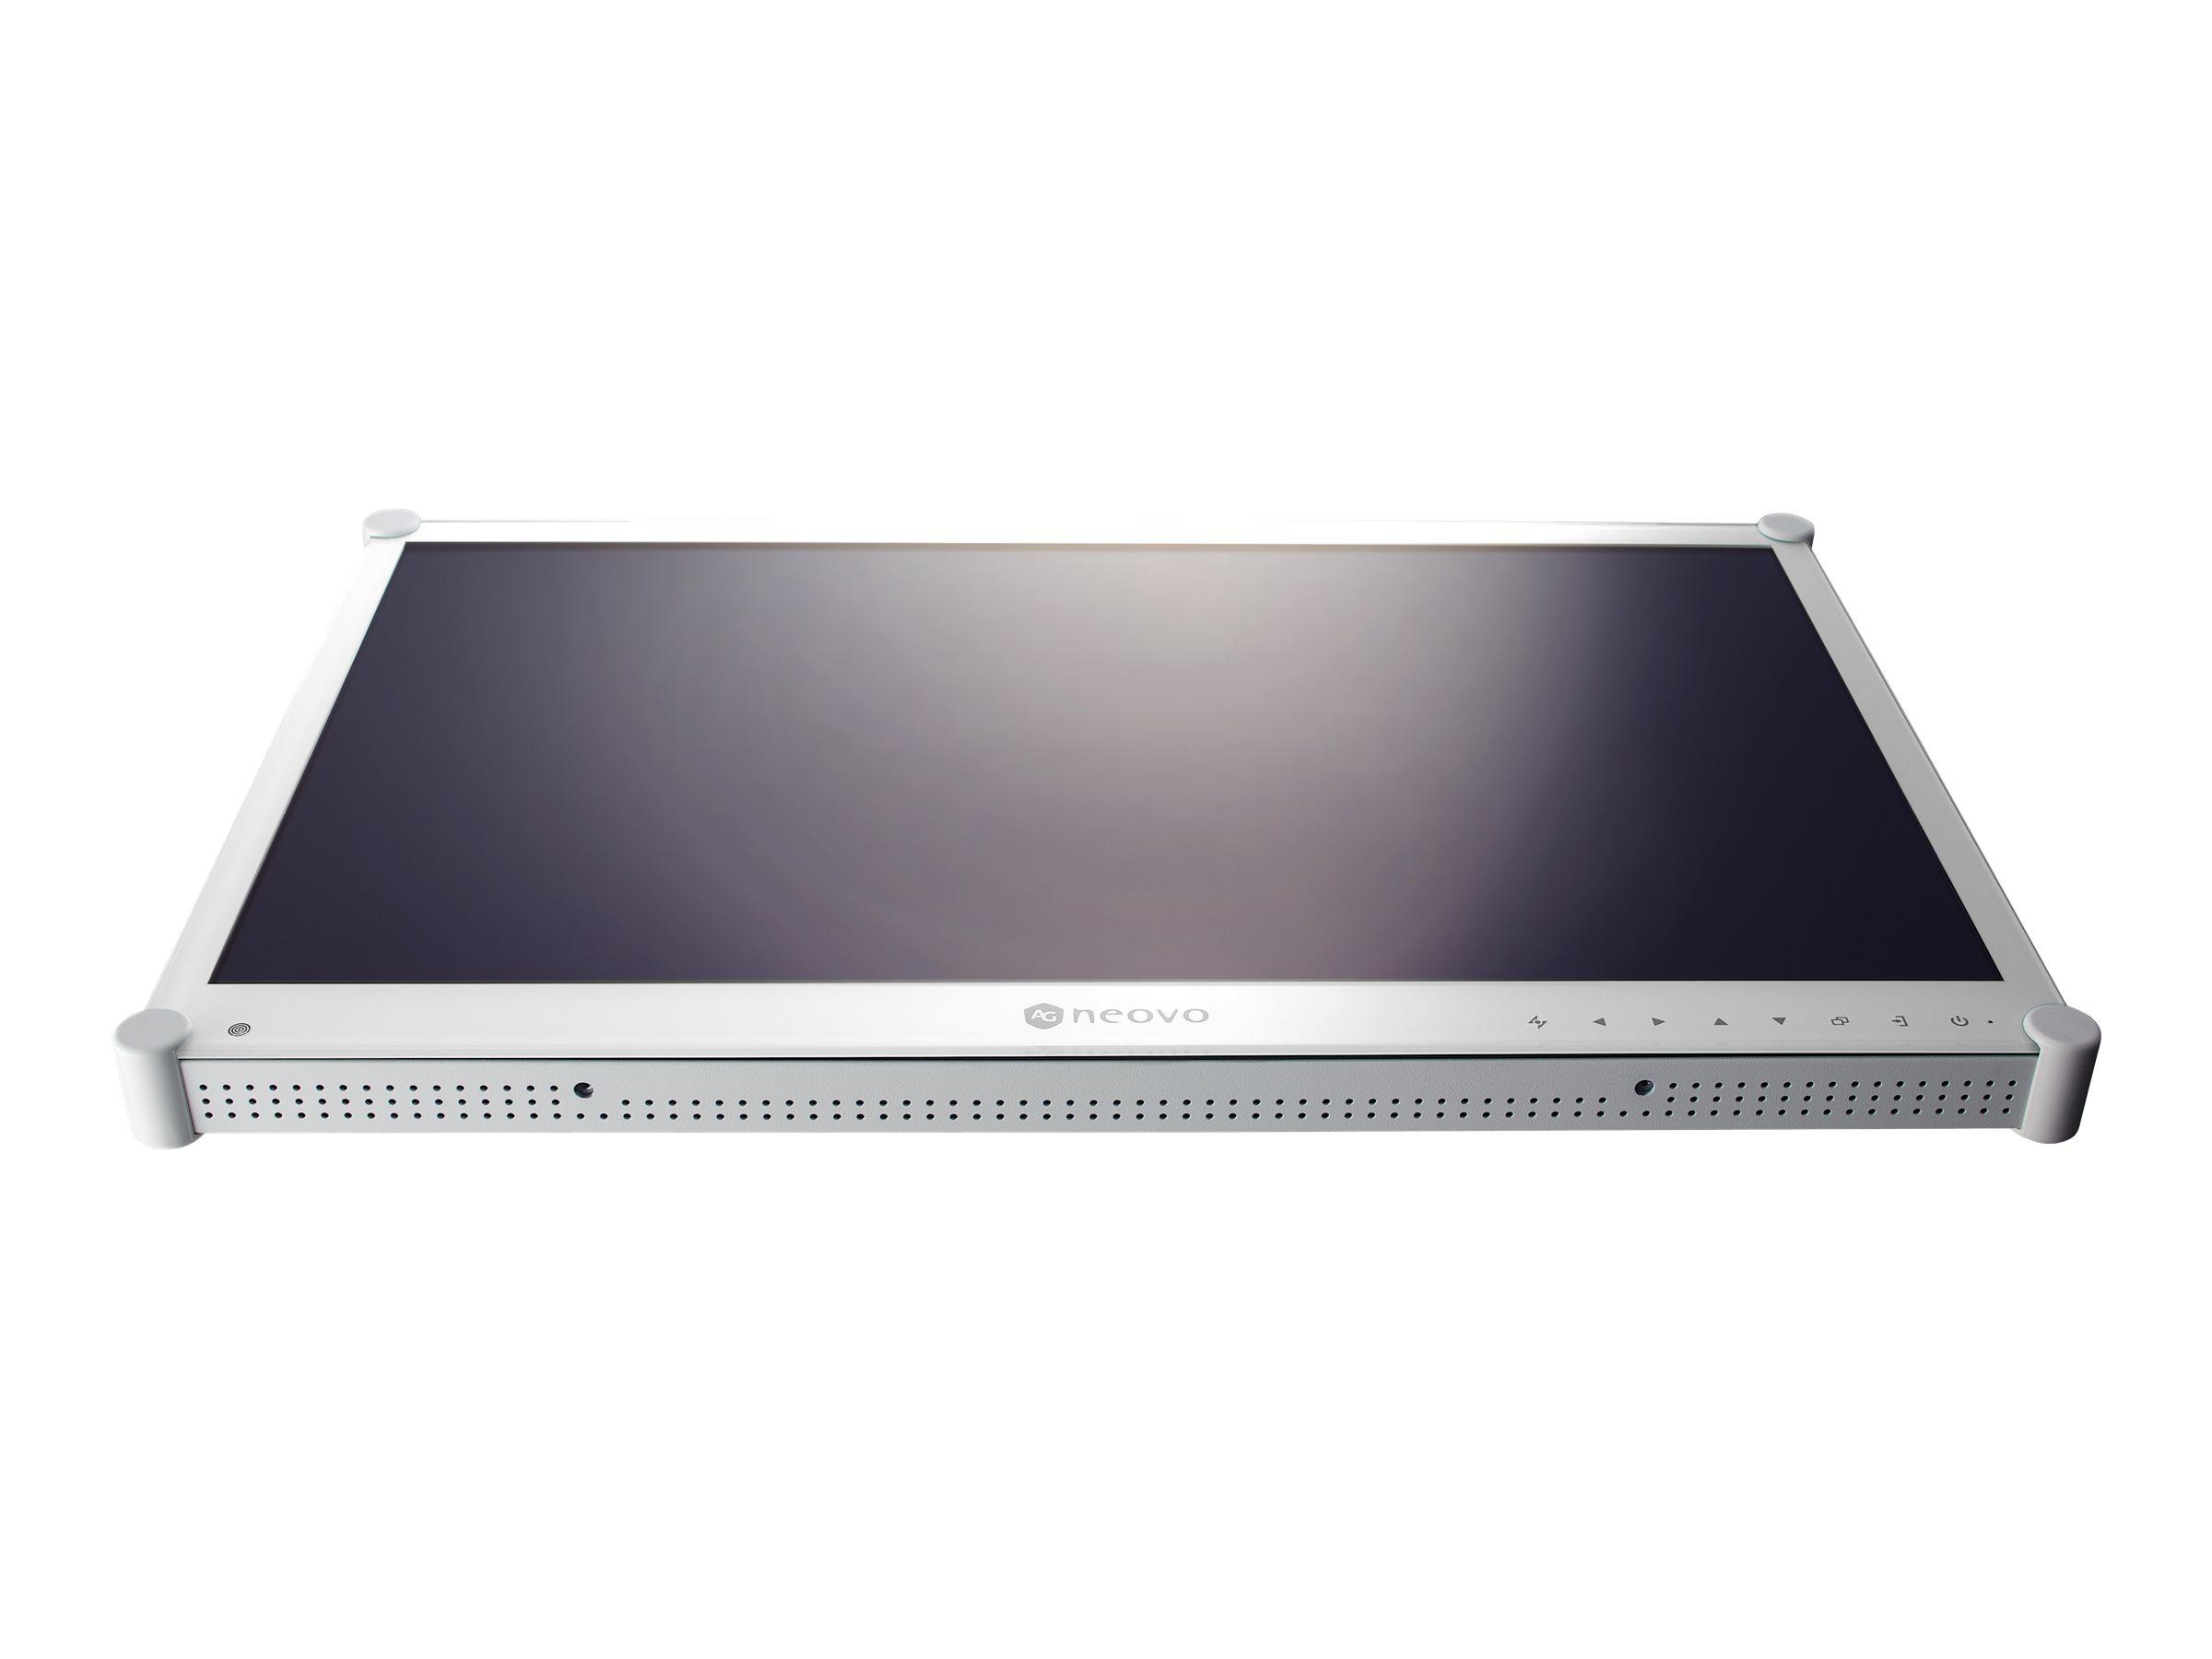 Neovo DR-22G - LED-Monitor - 54.6 cm (21.5